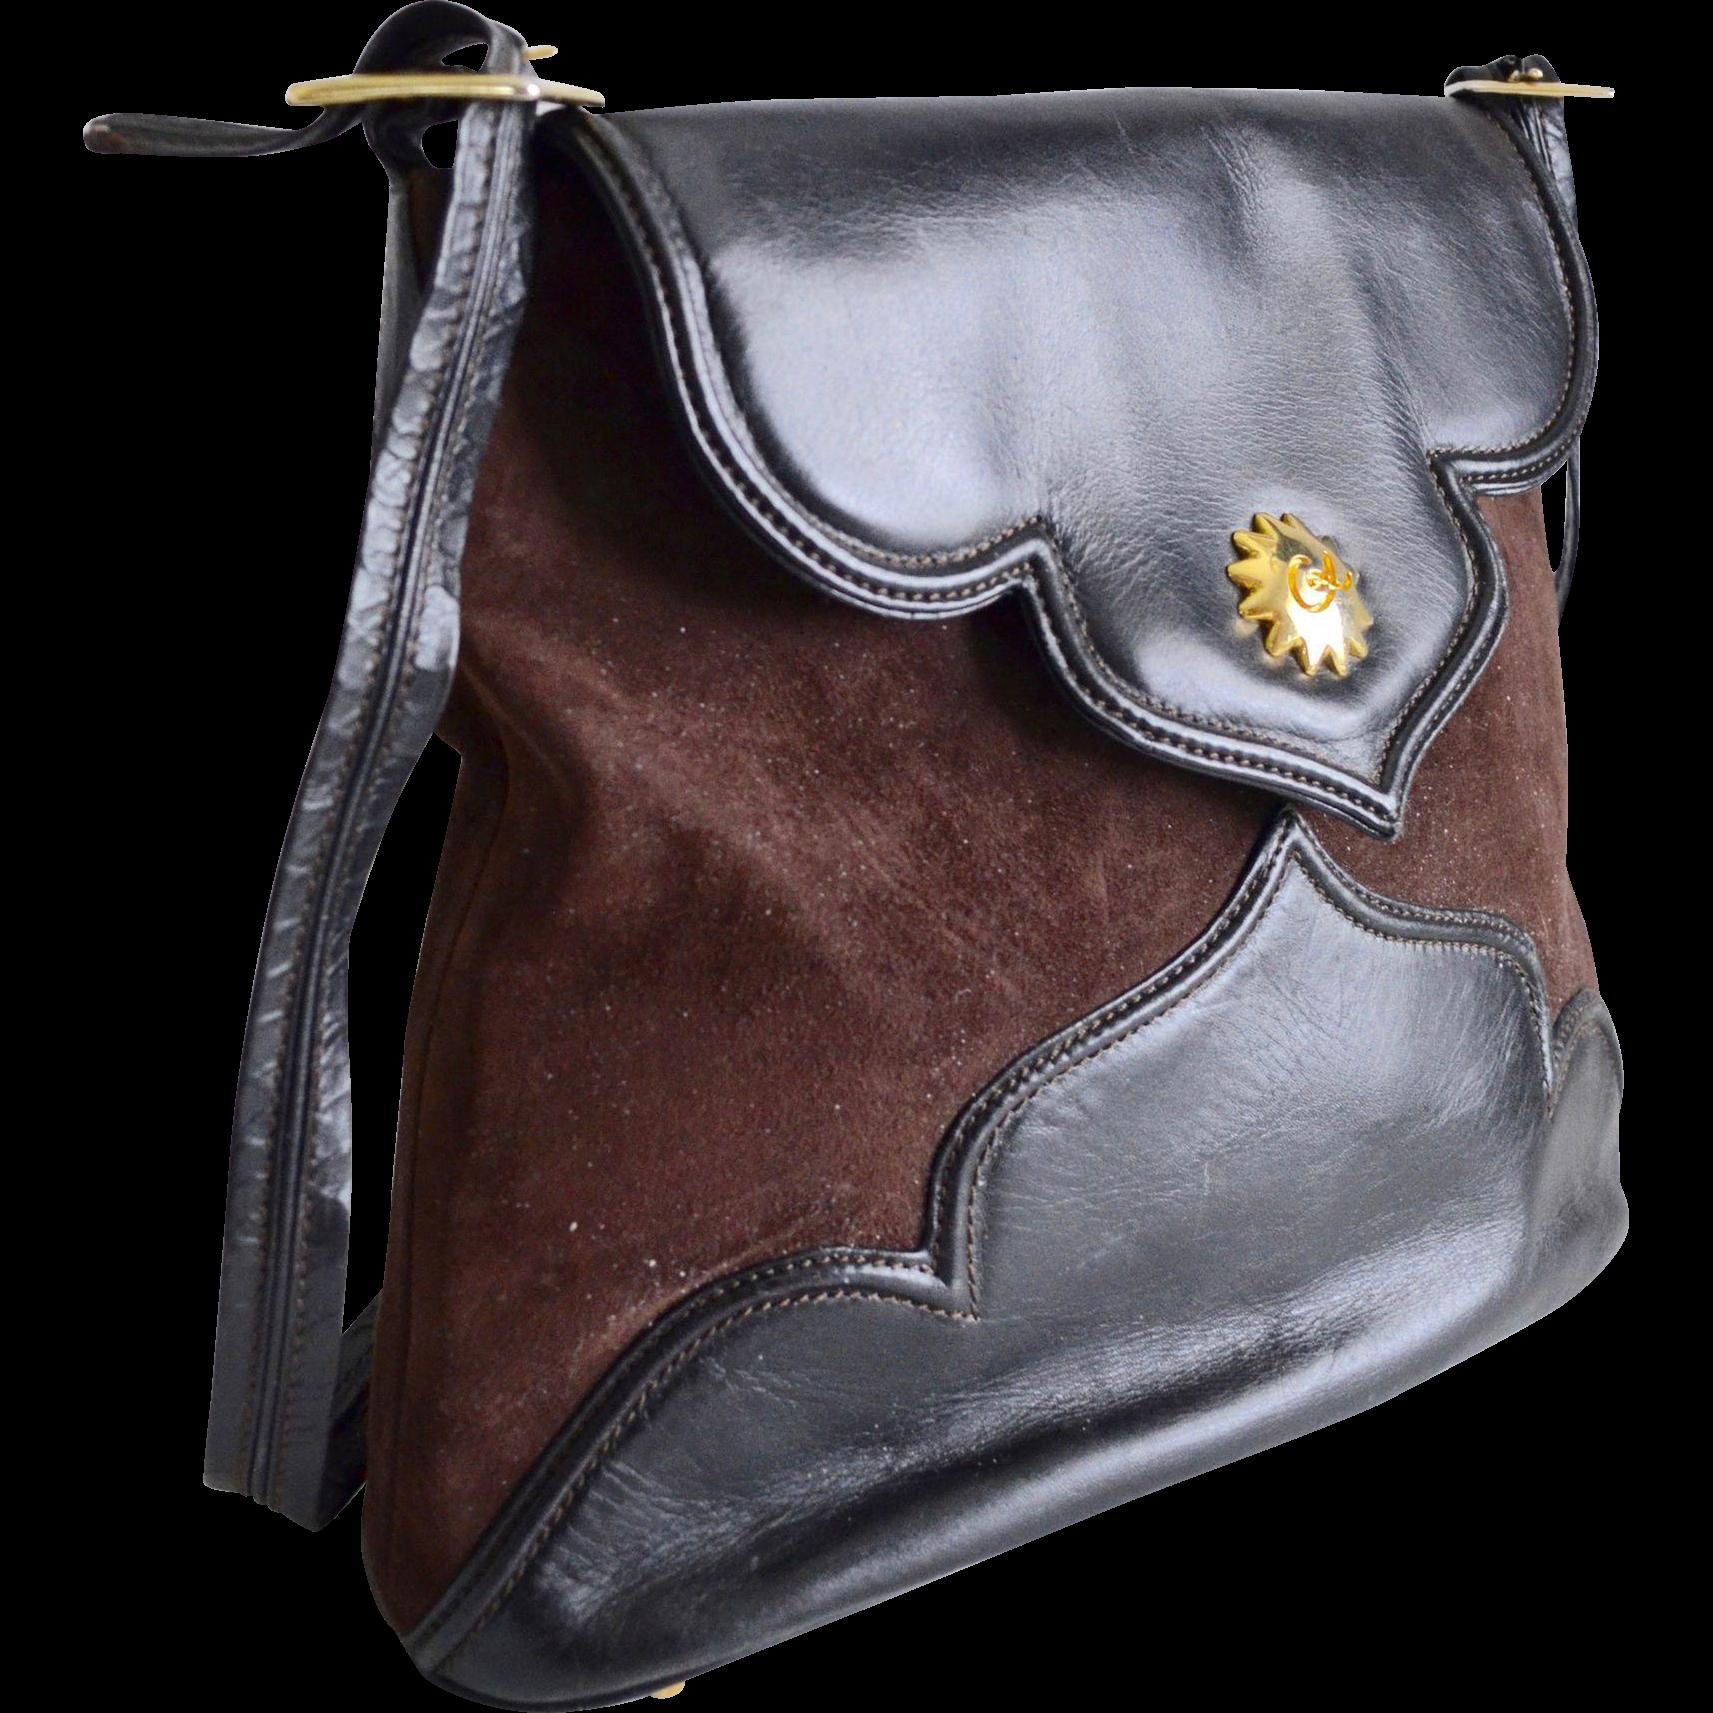 Christian Lacroix Calfskin Leather / Suede Tote Handbag